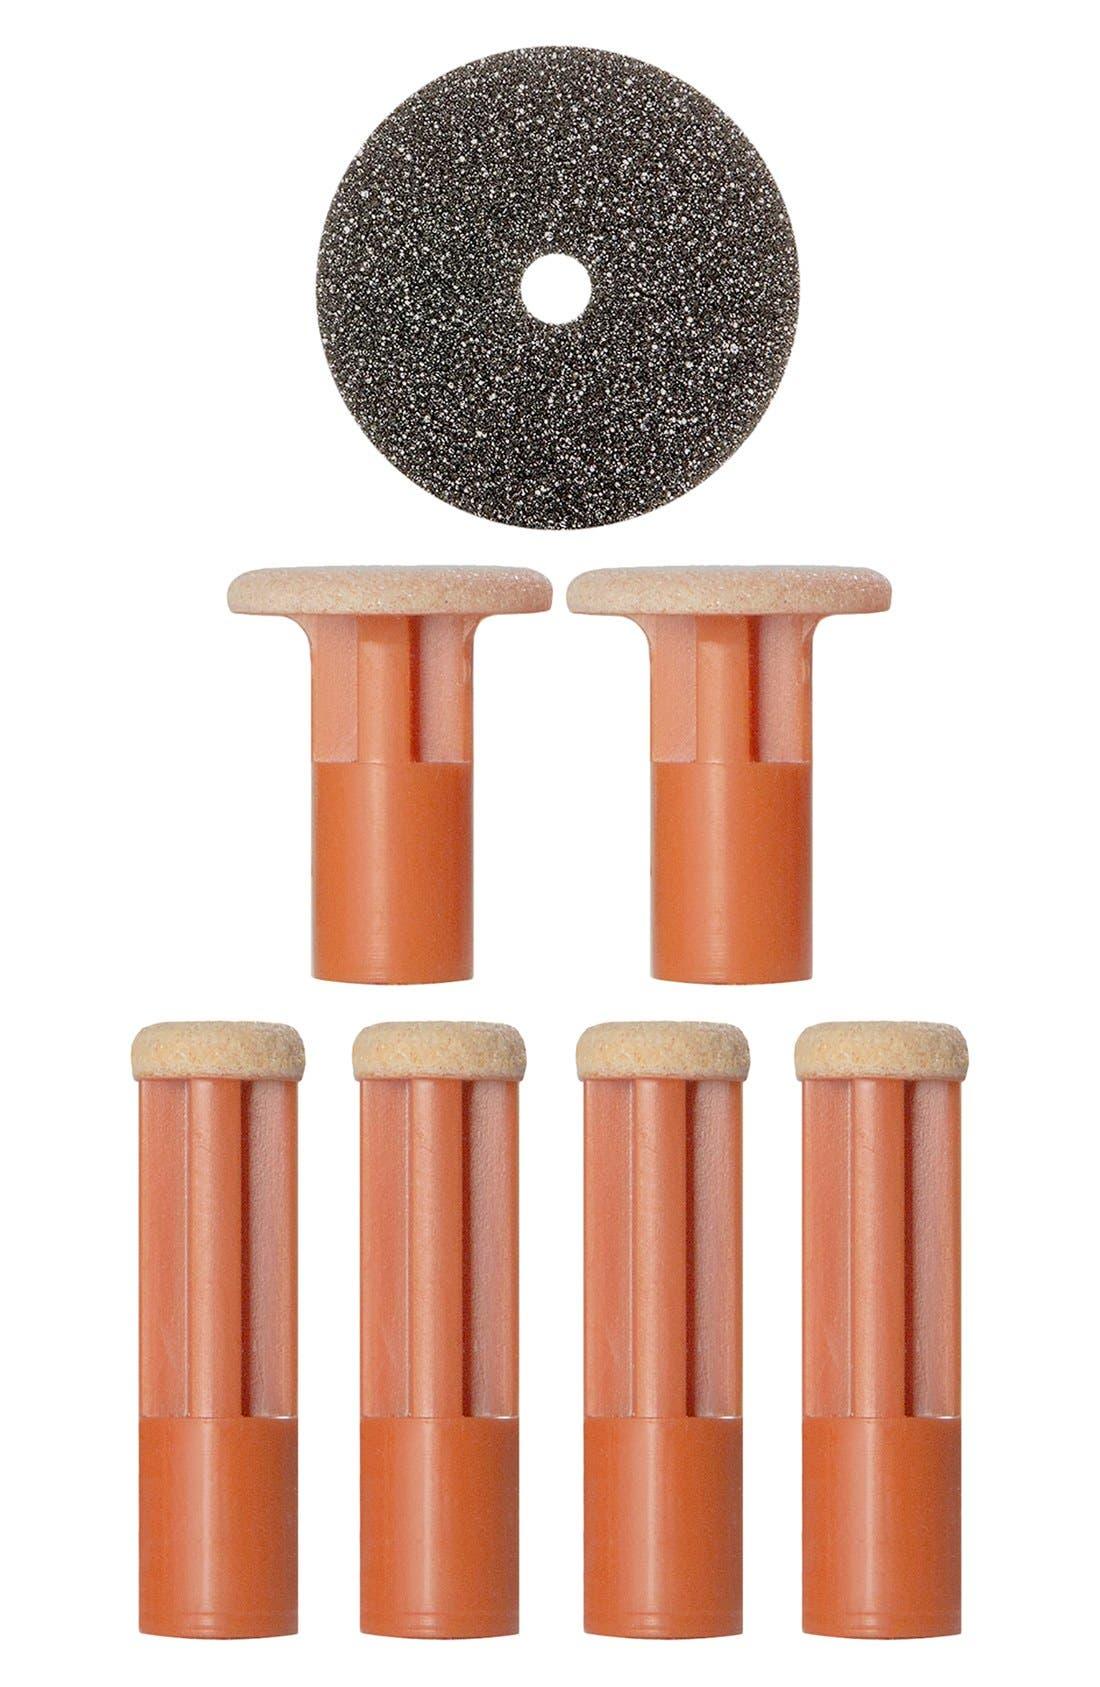 PMD Orange Coarse Replacement Discs, Main, color, NO COLOR